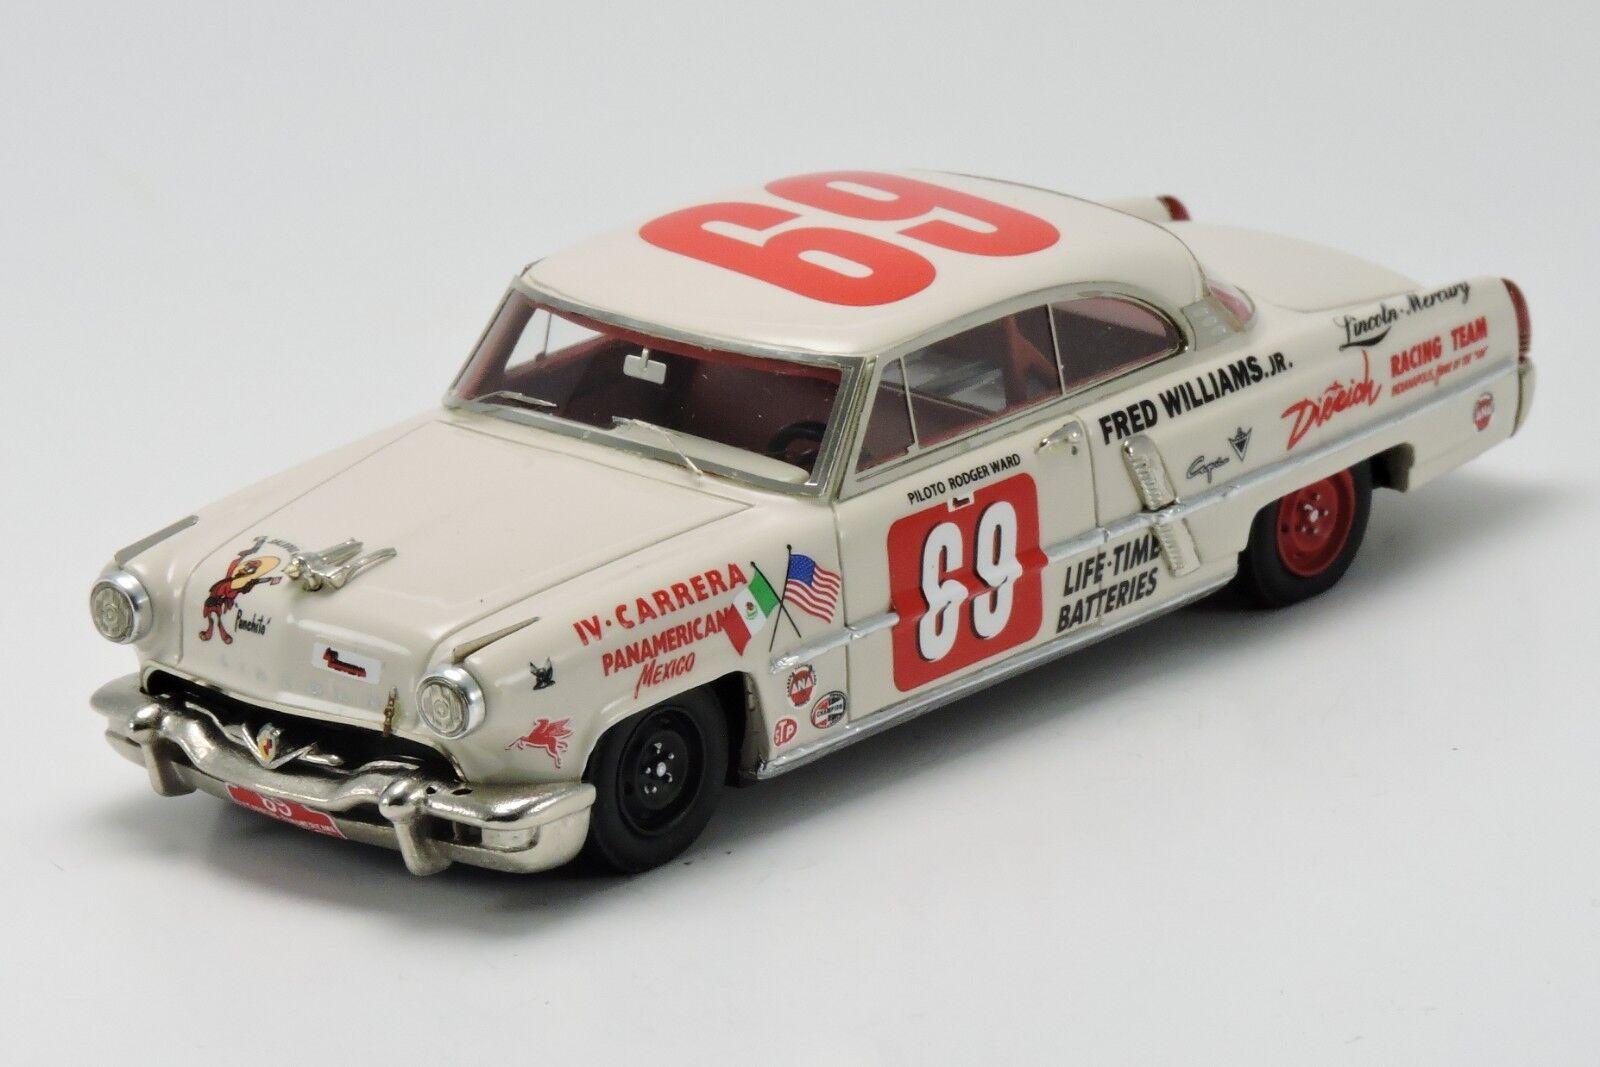 kit Lincoln Capri III Carrera Panamericana 1953  69 - Arena Models kit 1 43